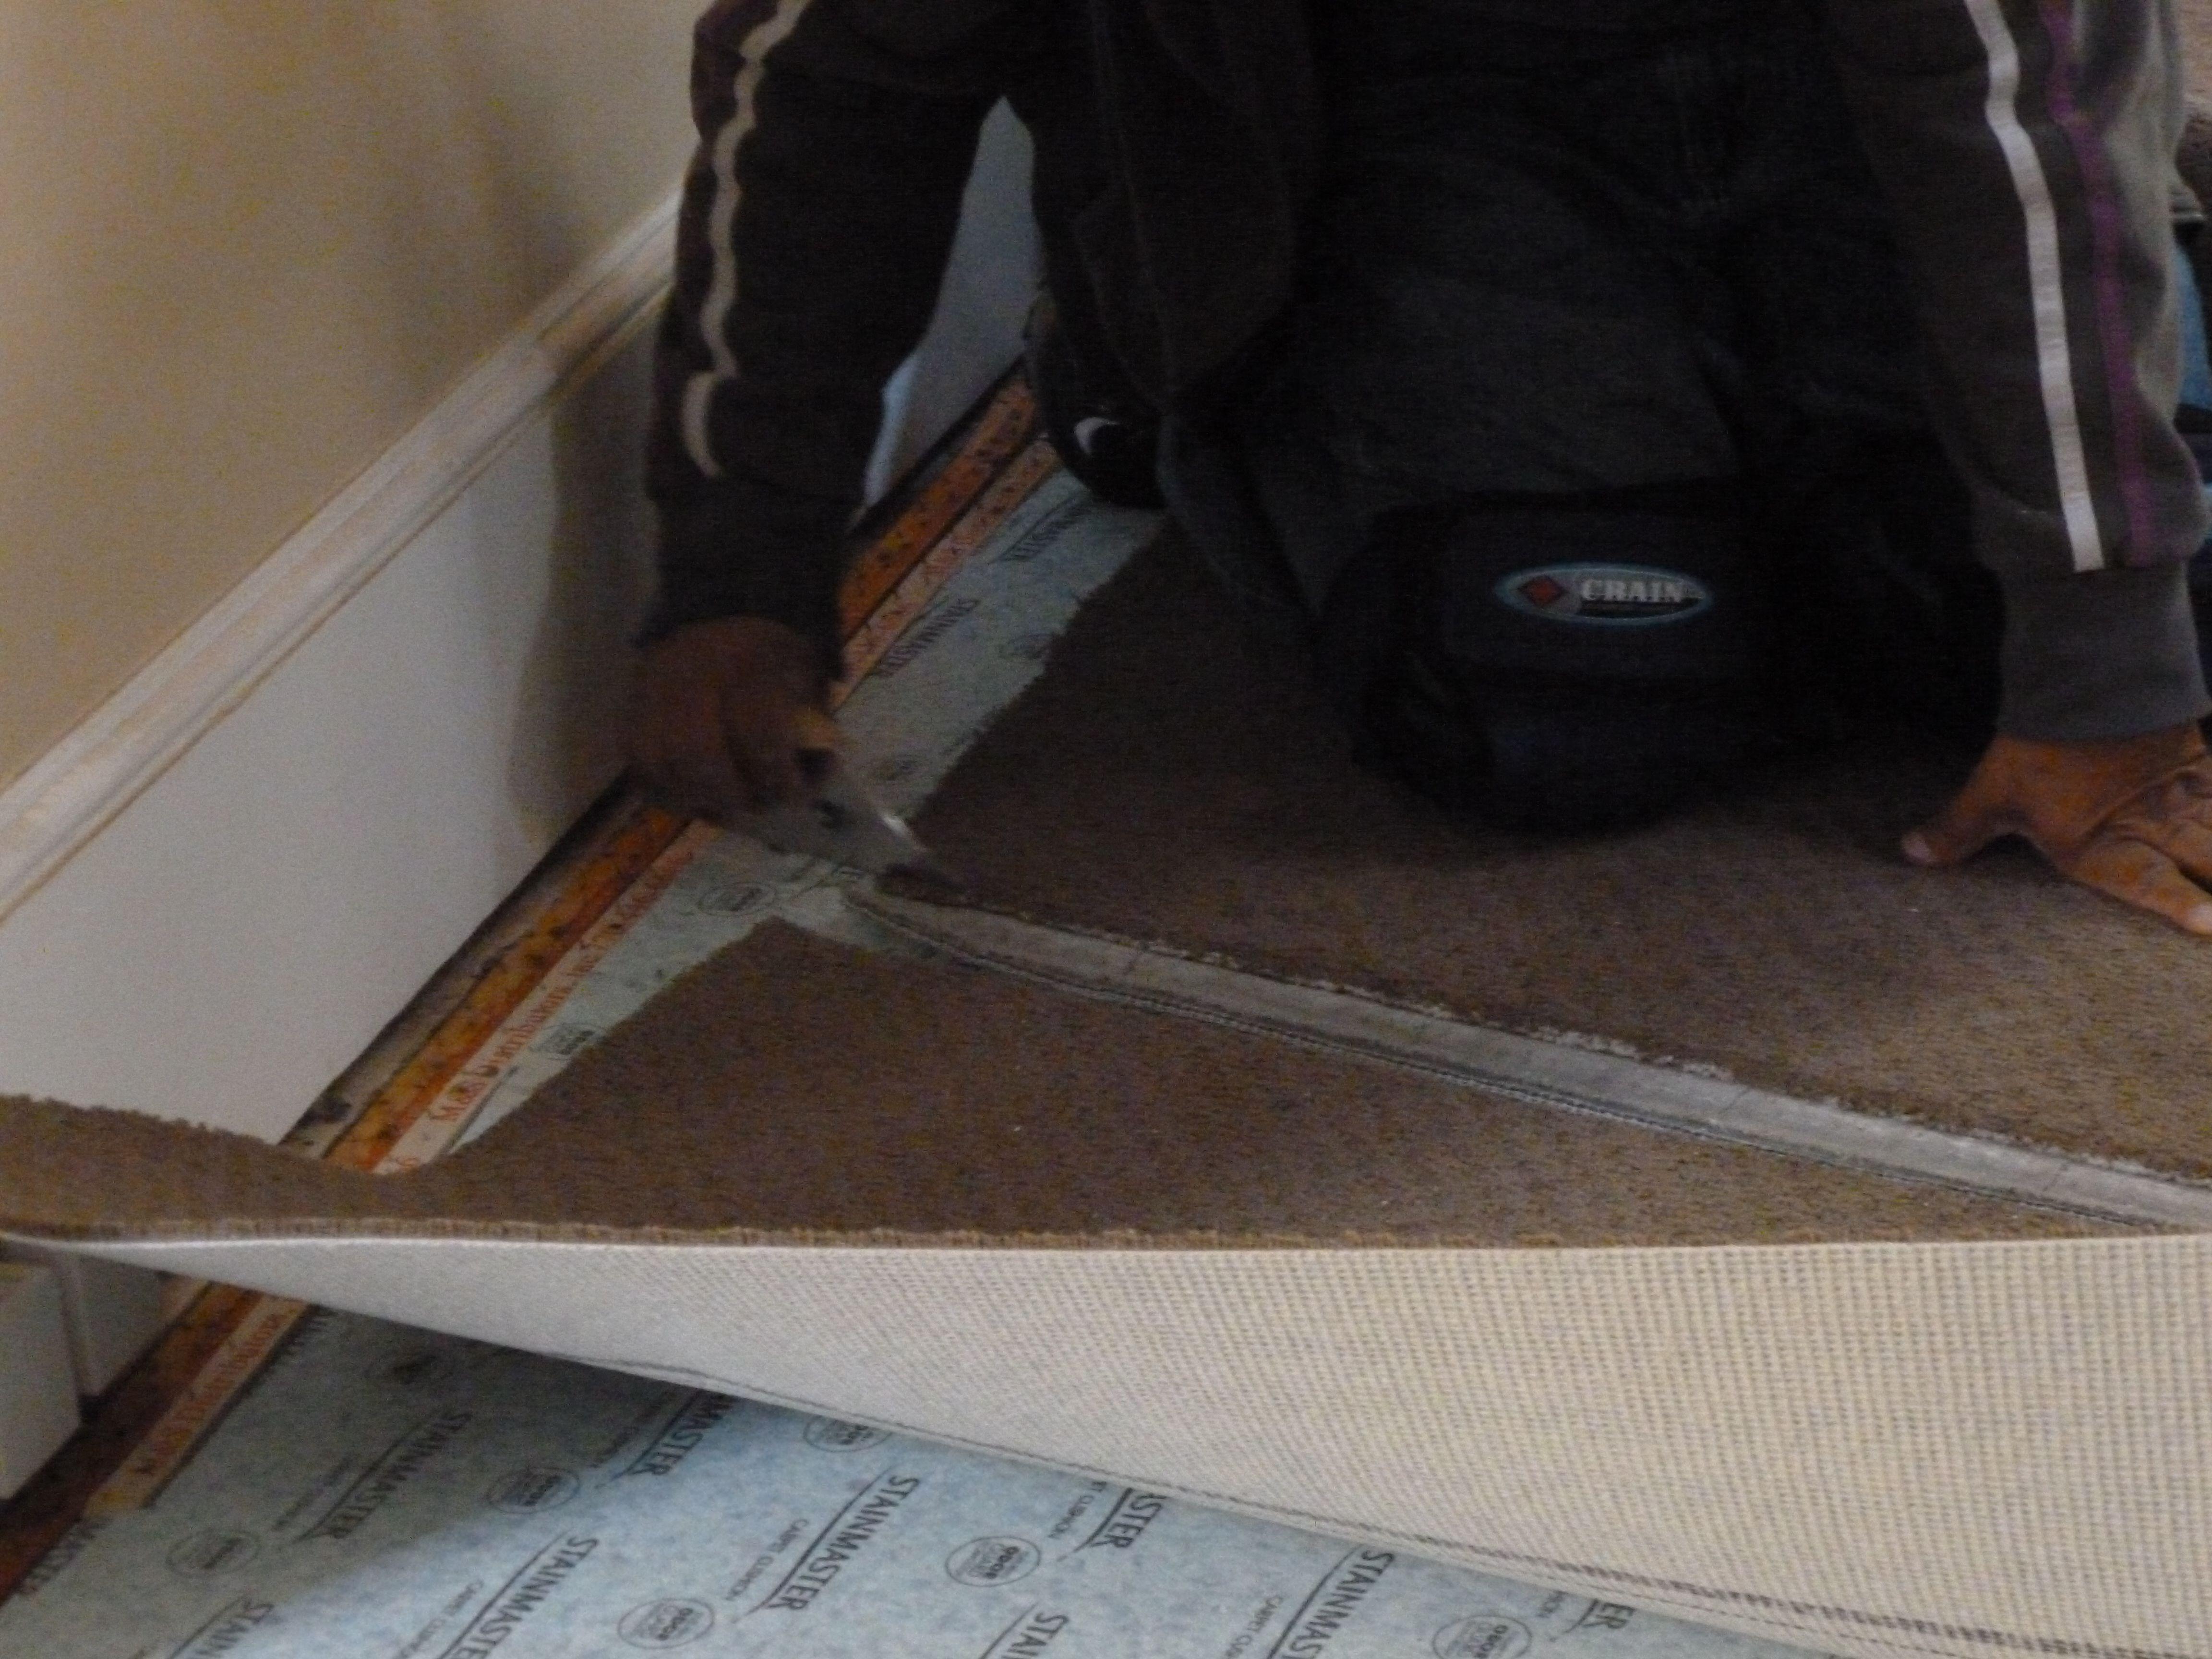 hardwood floor direction hallway of how to cut and glue carpet seams for 1 56a2fd435f9b58b7d0cfffec jpg